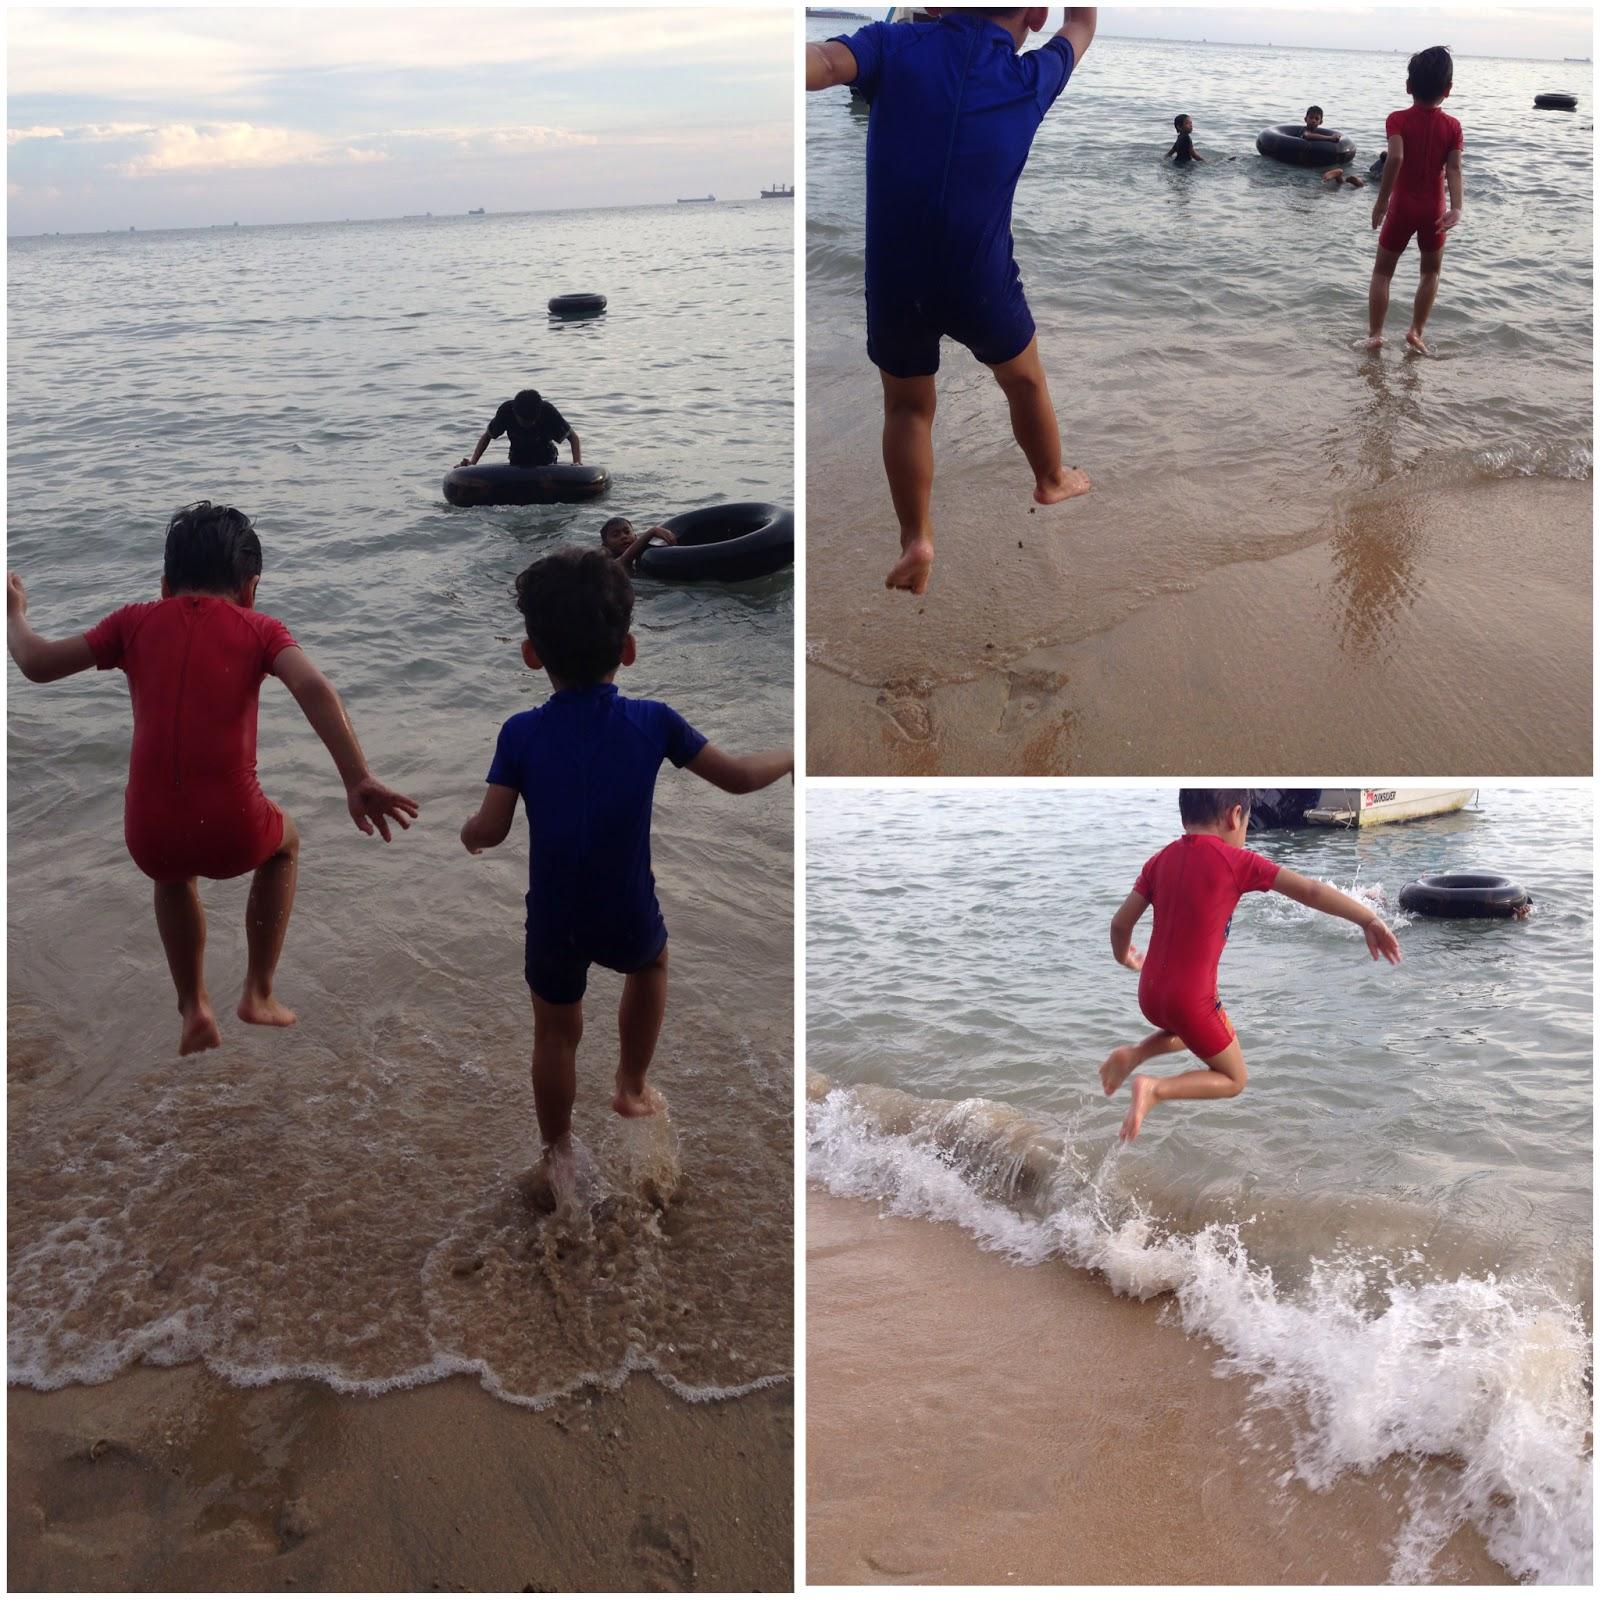 Reasons To Smile June 2015 Tendencies Kaos Beach Life Perak M And Then We Went Teluk Batik Hang Out By The Note Kazim Didnt Dip Himself In Water He Just Played Kat